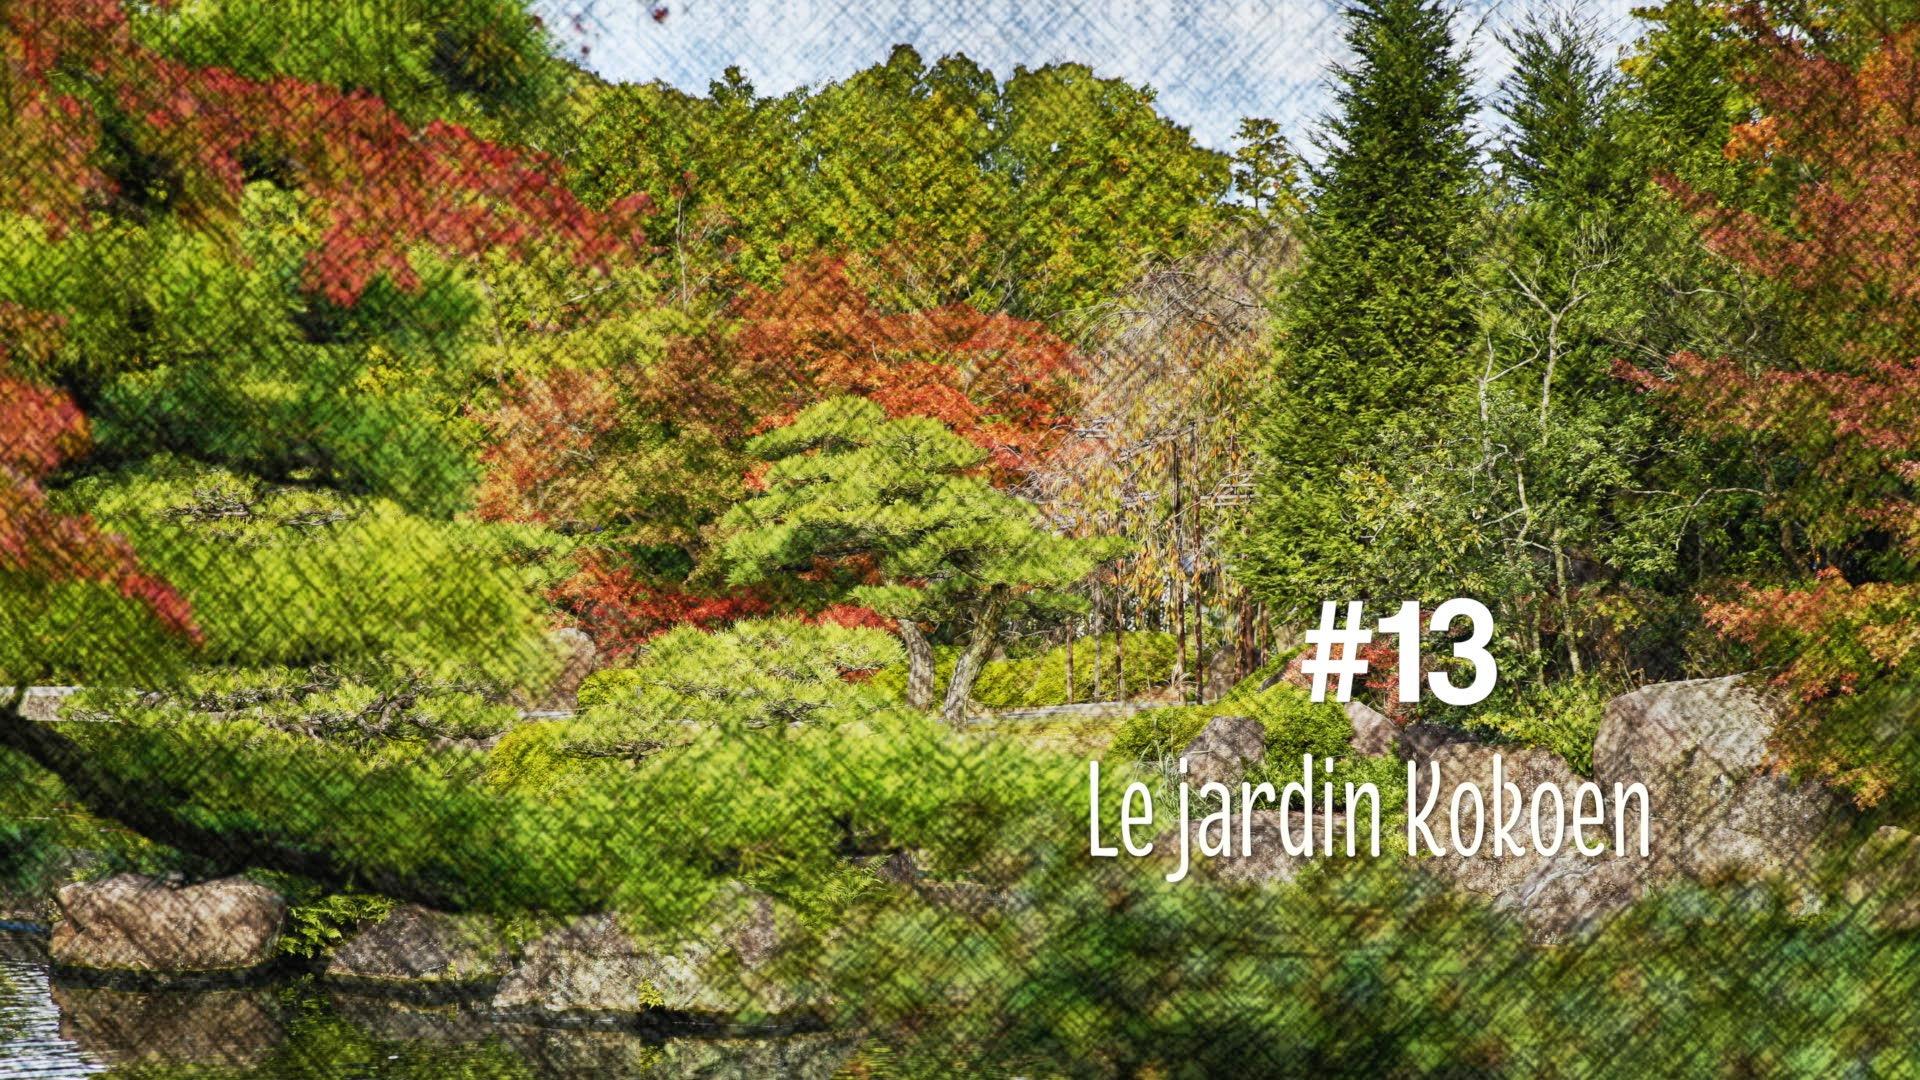 Le jardin koko en himeji 13 la balade du sakura for Jardin kokoen